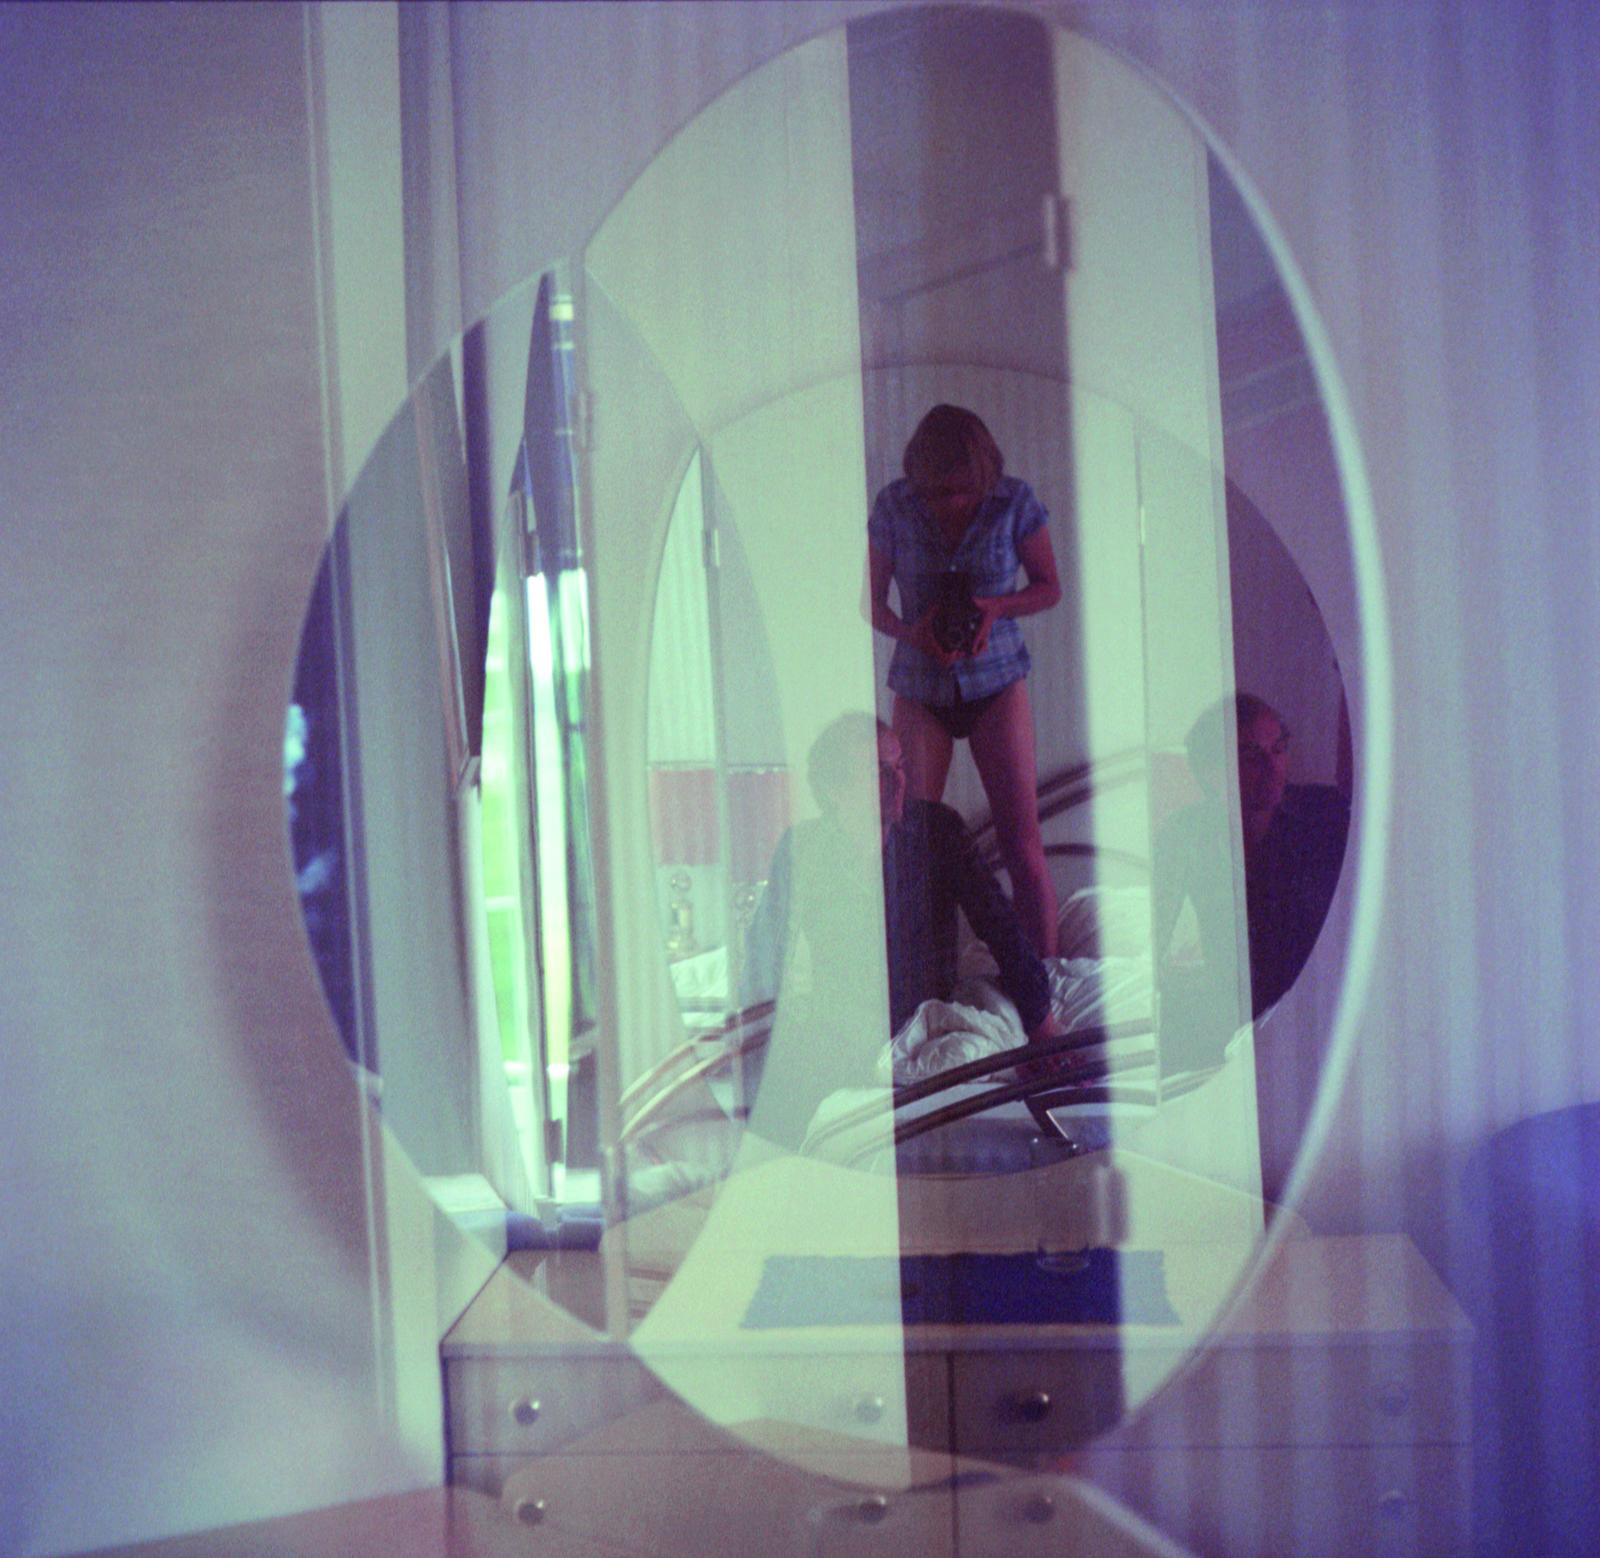 """Geometrie des Raumes"", 2011 © Susa Templin; Courtesy Galerie Thomas Rehbein"